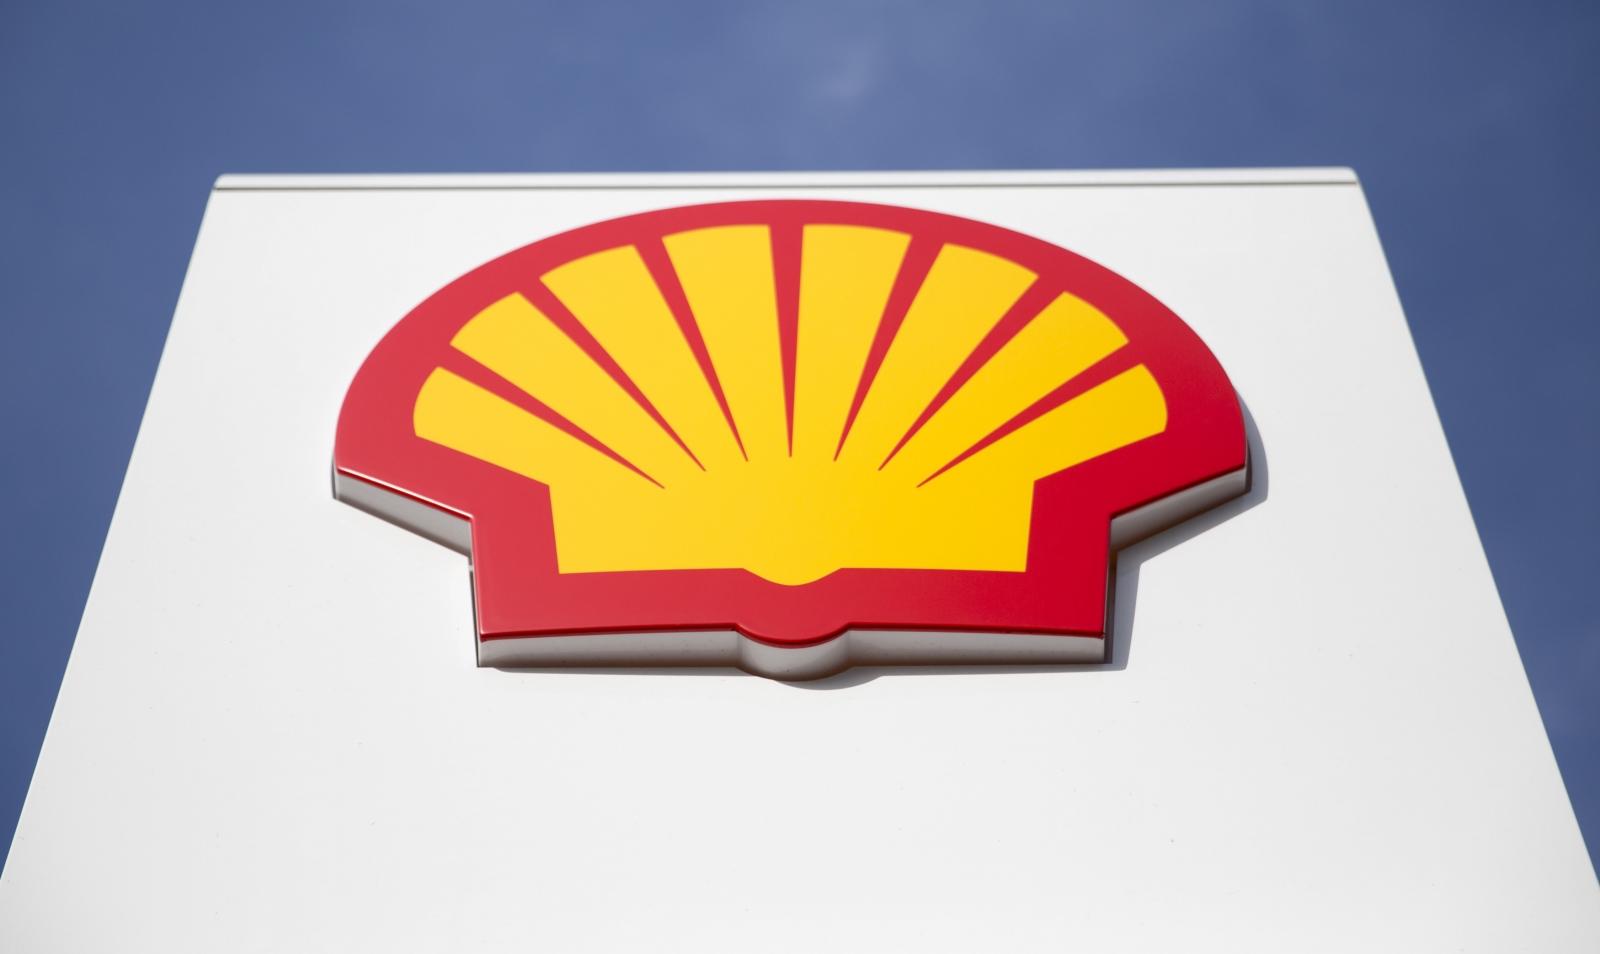 shell speeds up nigeria oilfields 5bn selloff plans